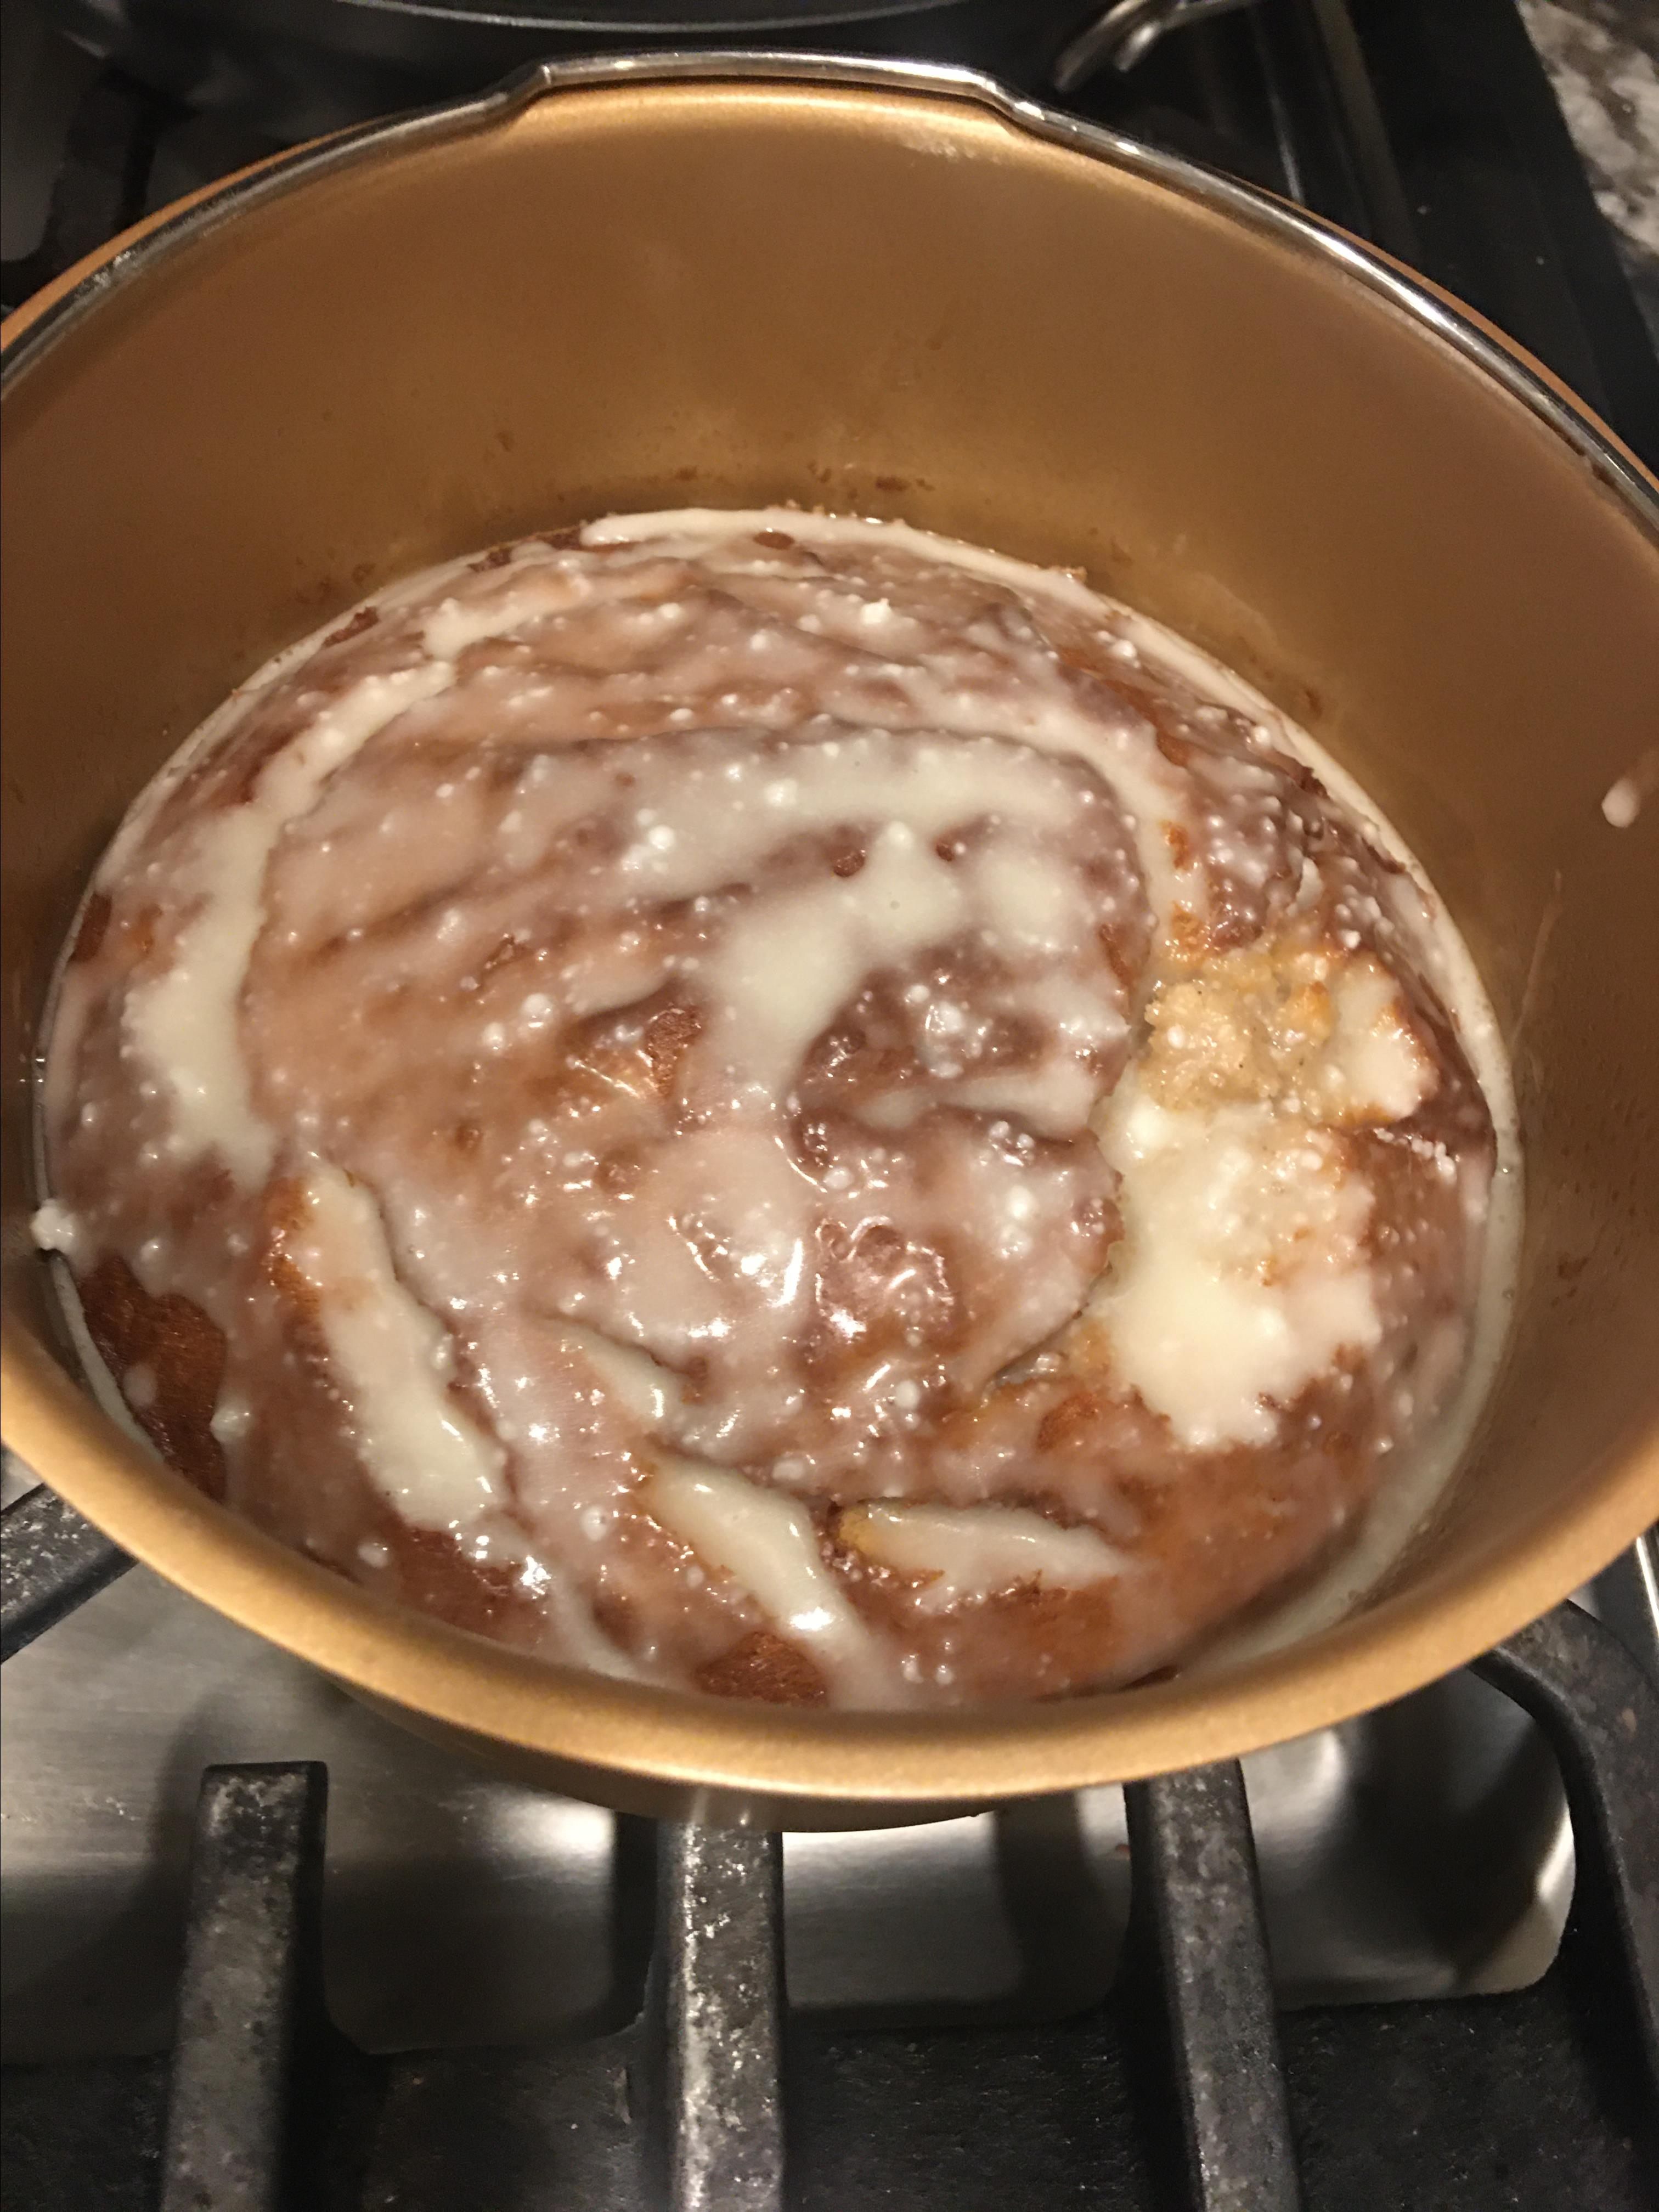 Air-Fried Banana Cake solidrock4me